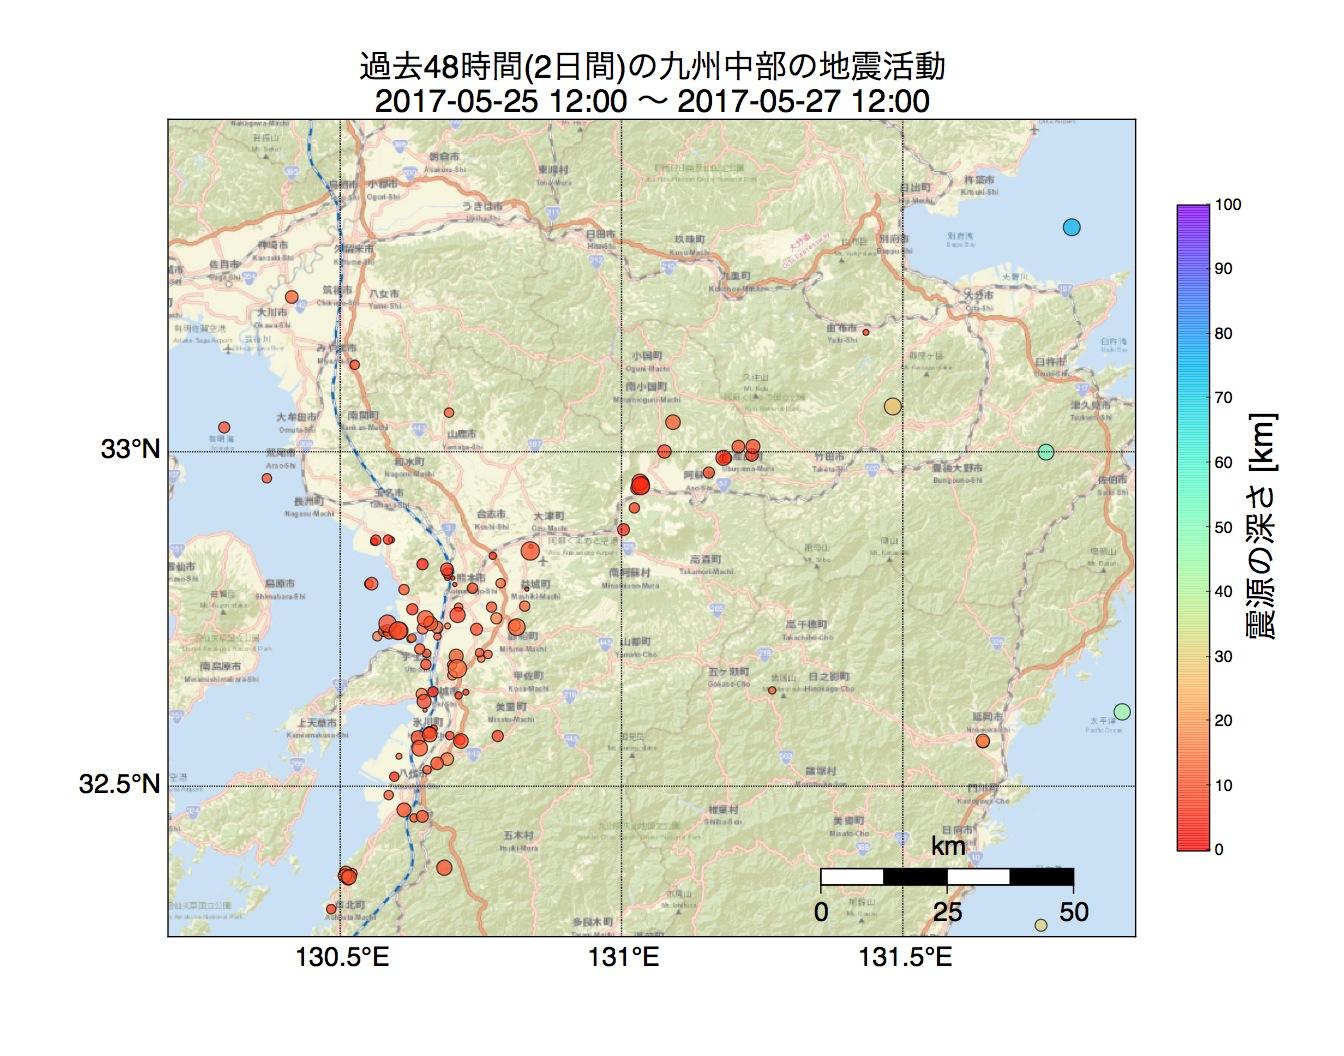 http://jishin.chamu.org/aso/20170527_2.jpg